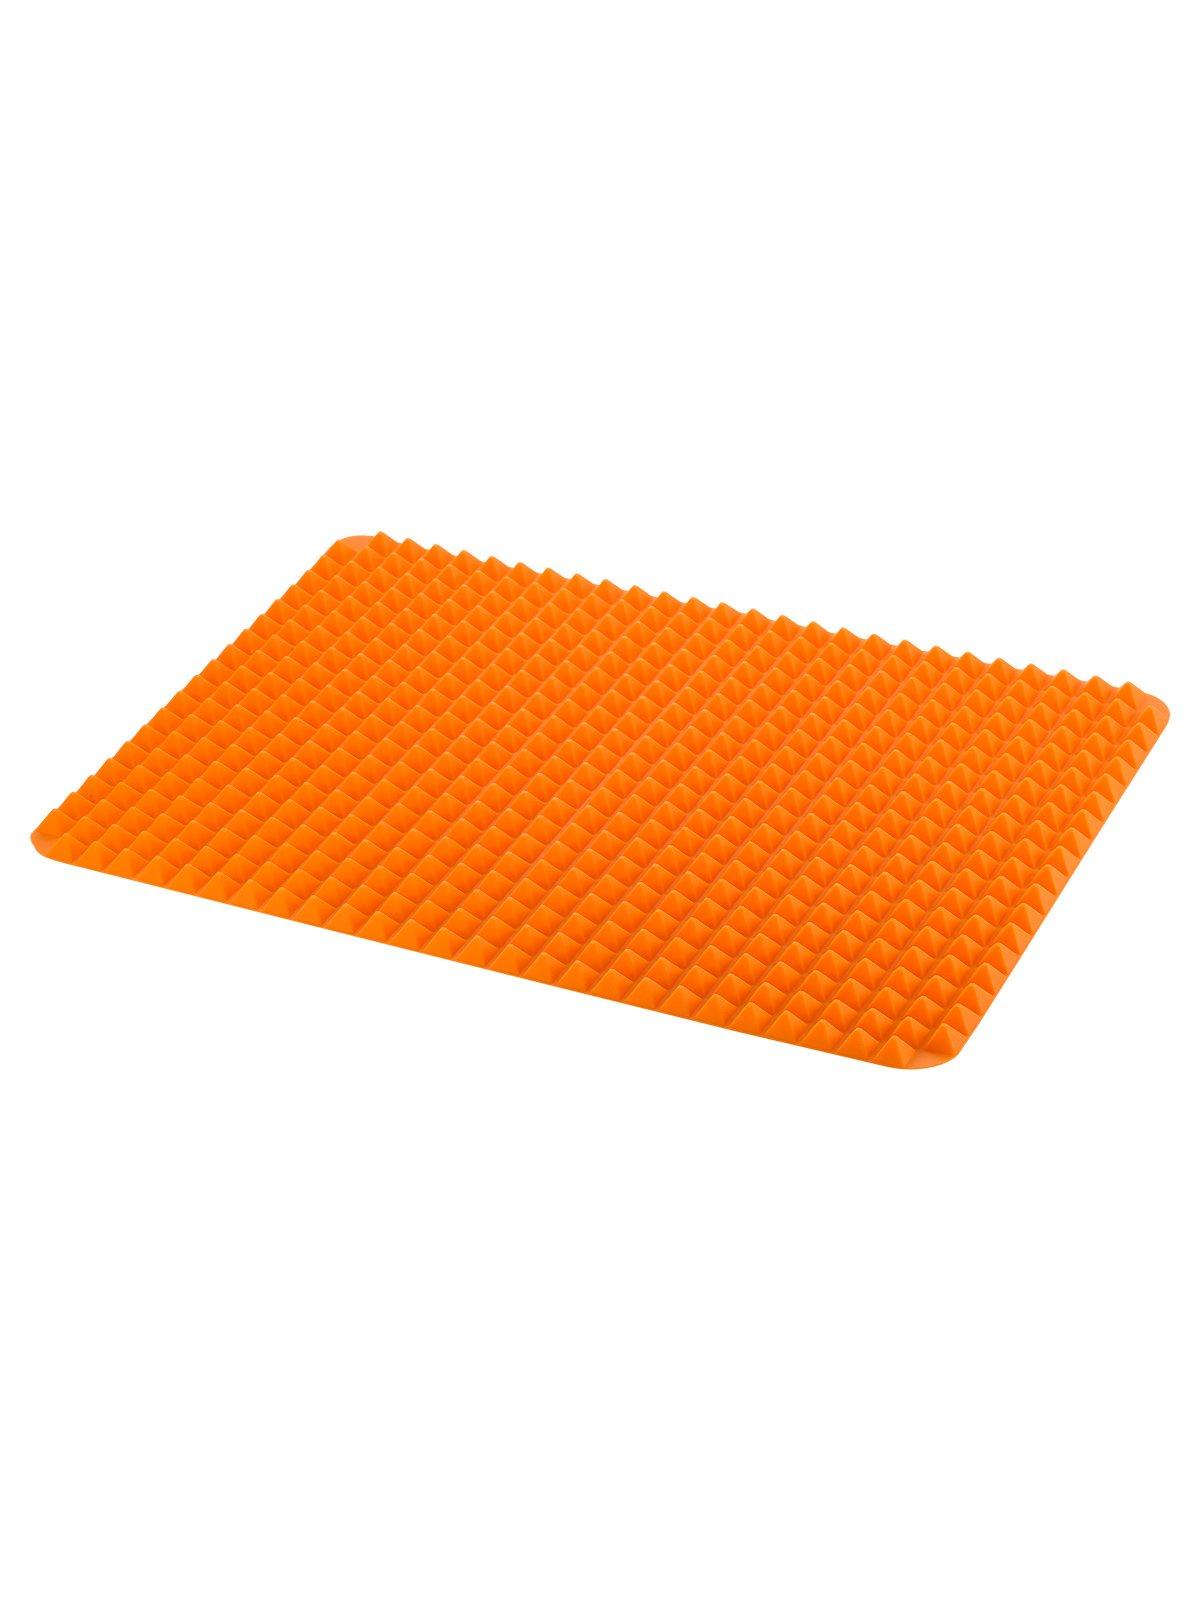 Форма для выпечки HomeMaster 229, SHM049-4, оранжевый